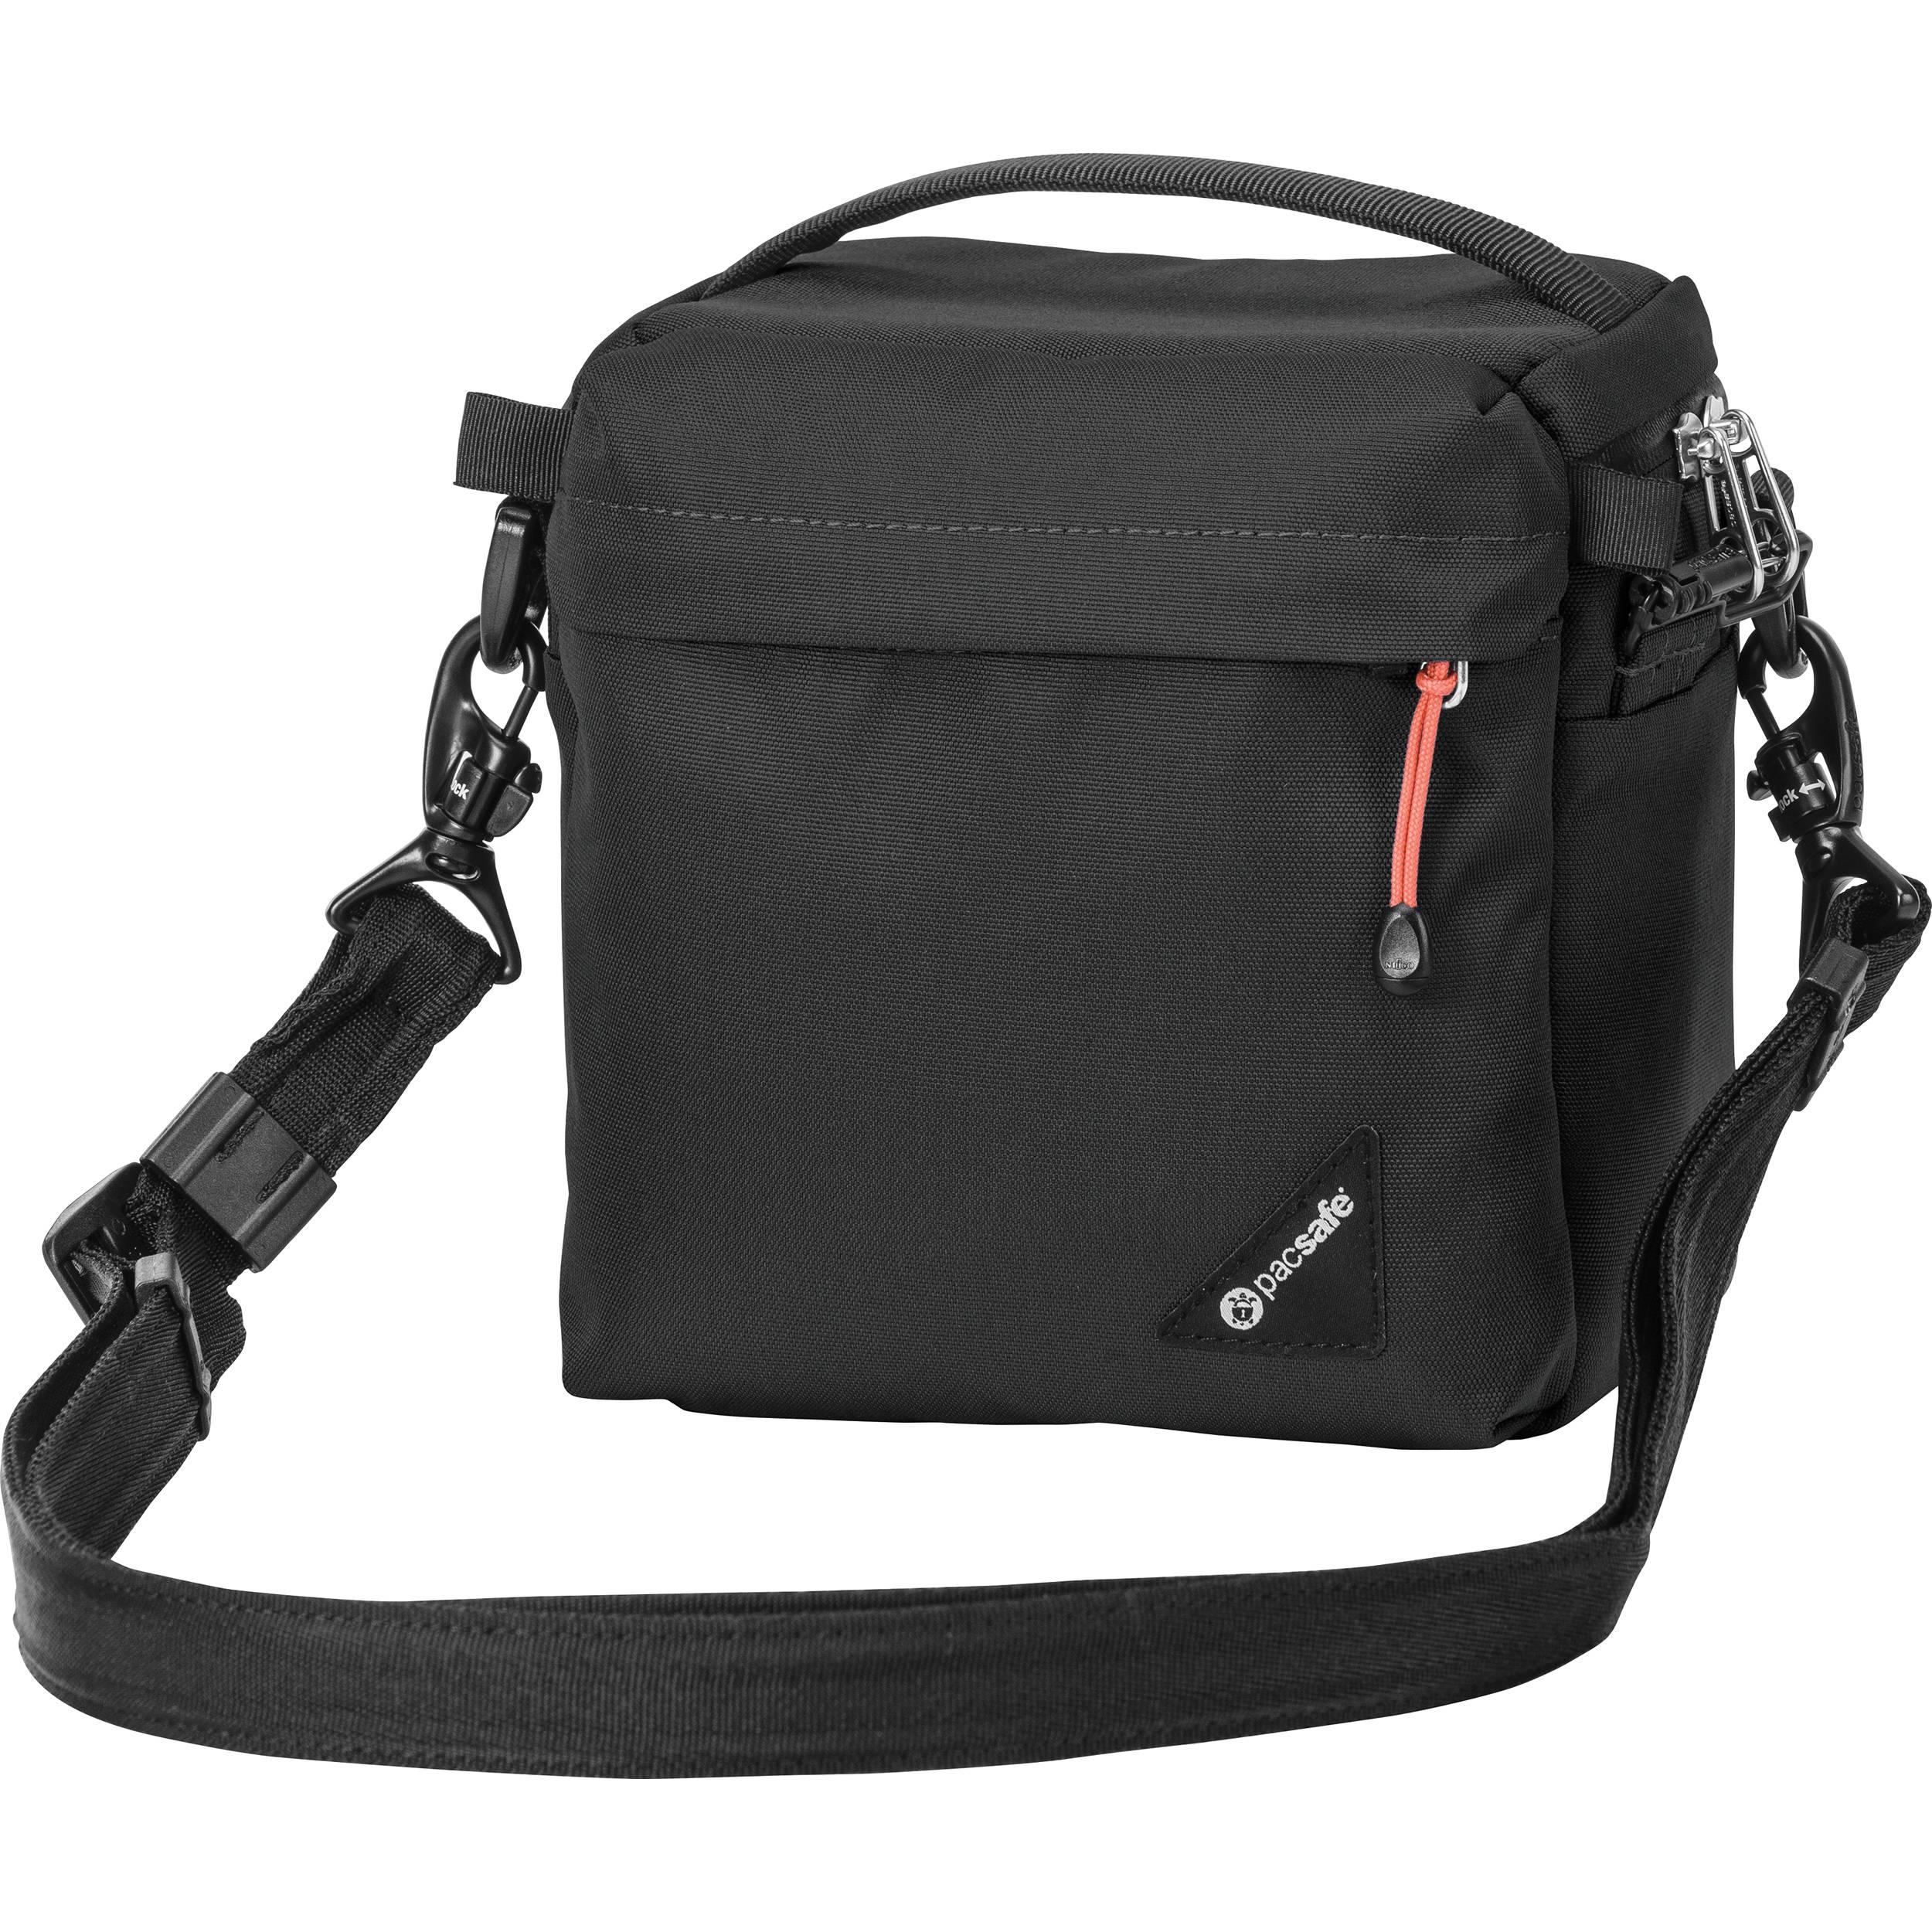 Pacsafe Camsafe Lx3 Anti Theft Compact Camera Bag Black